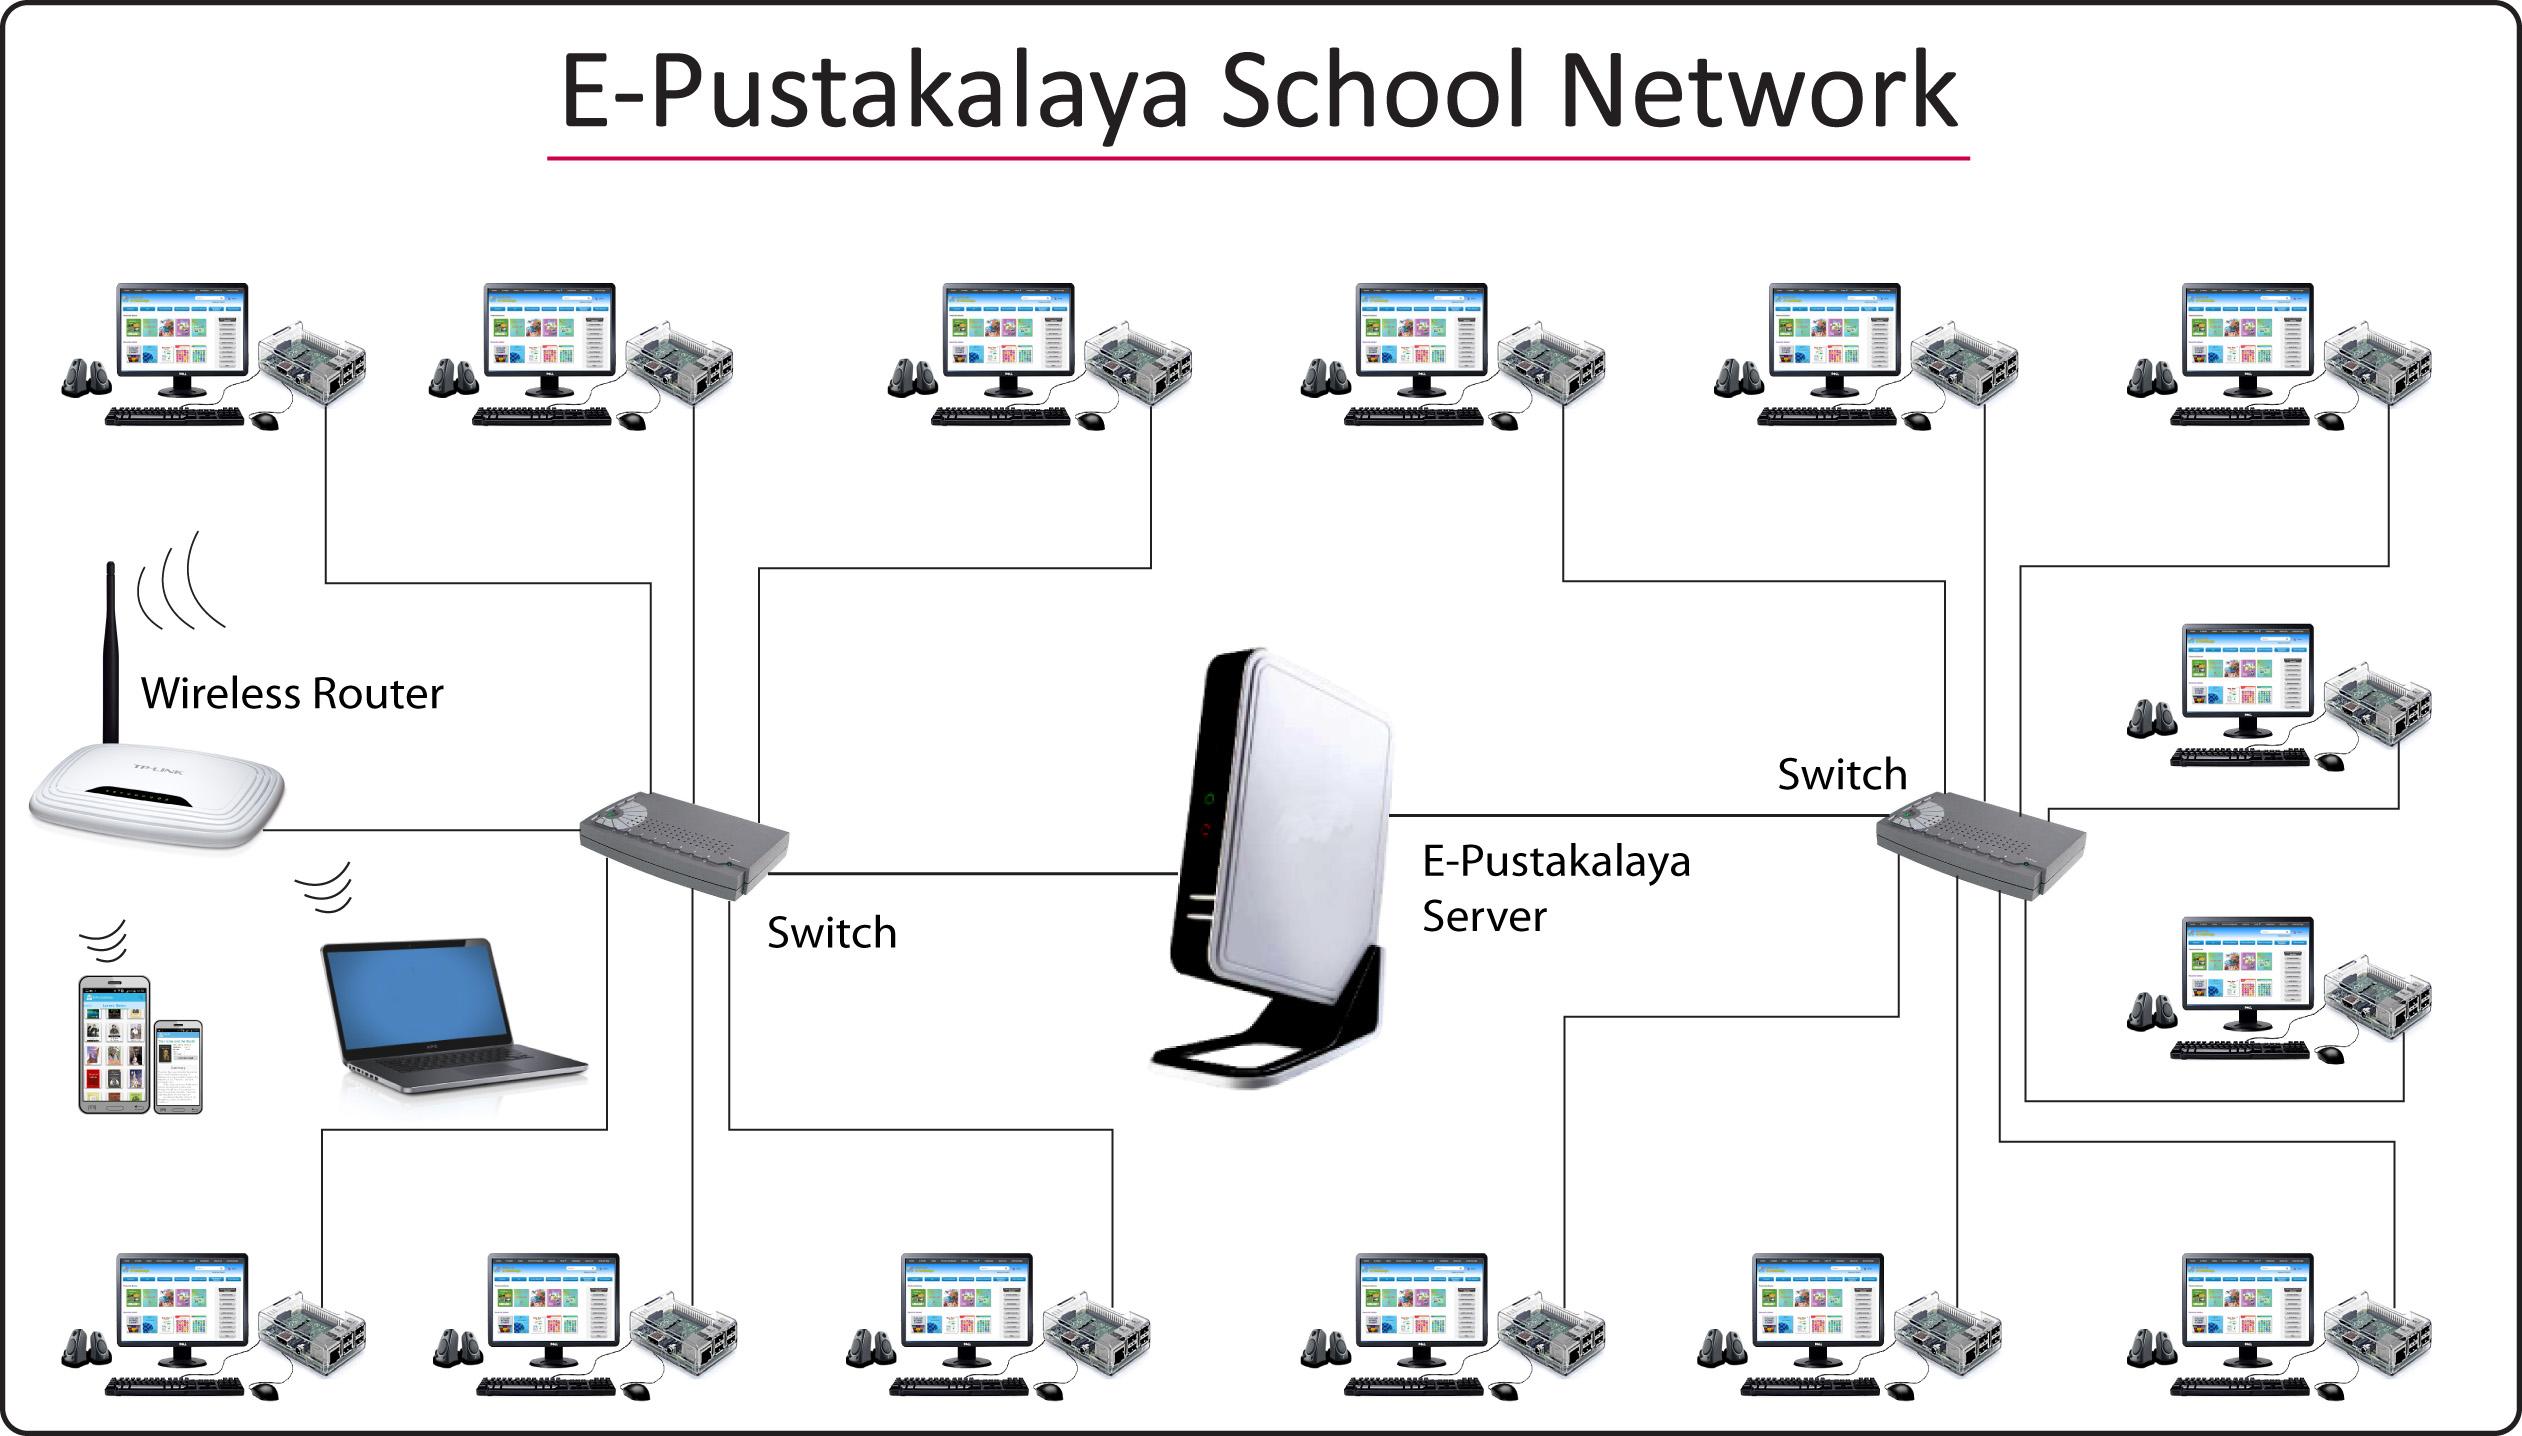 E-Pustakalaya school network with Raspberry Pi